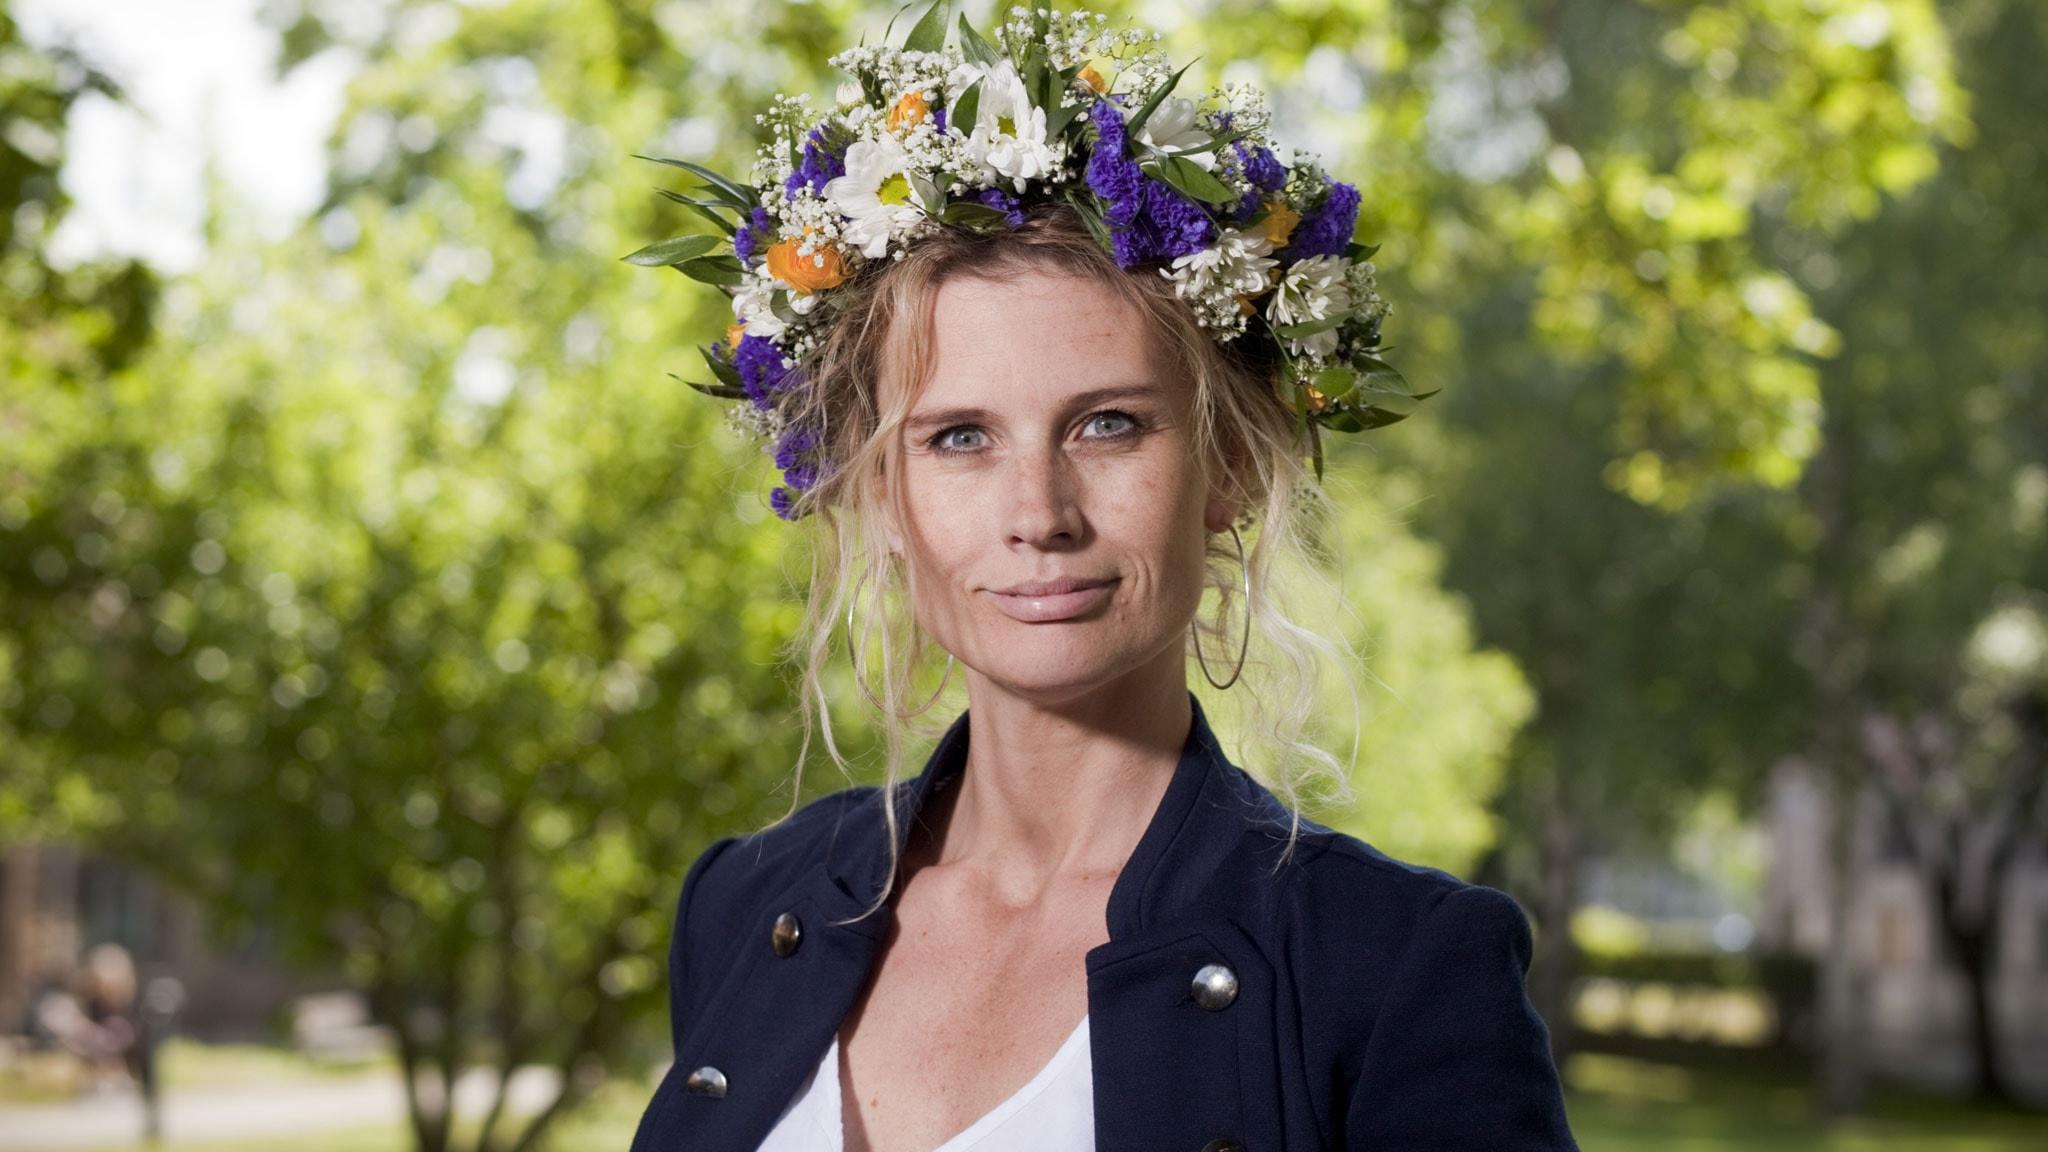 Foto: Mattias Ahlm/Sveriges Radio.